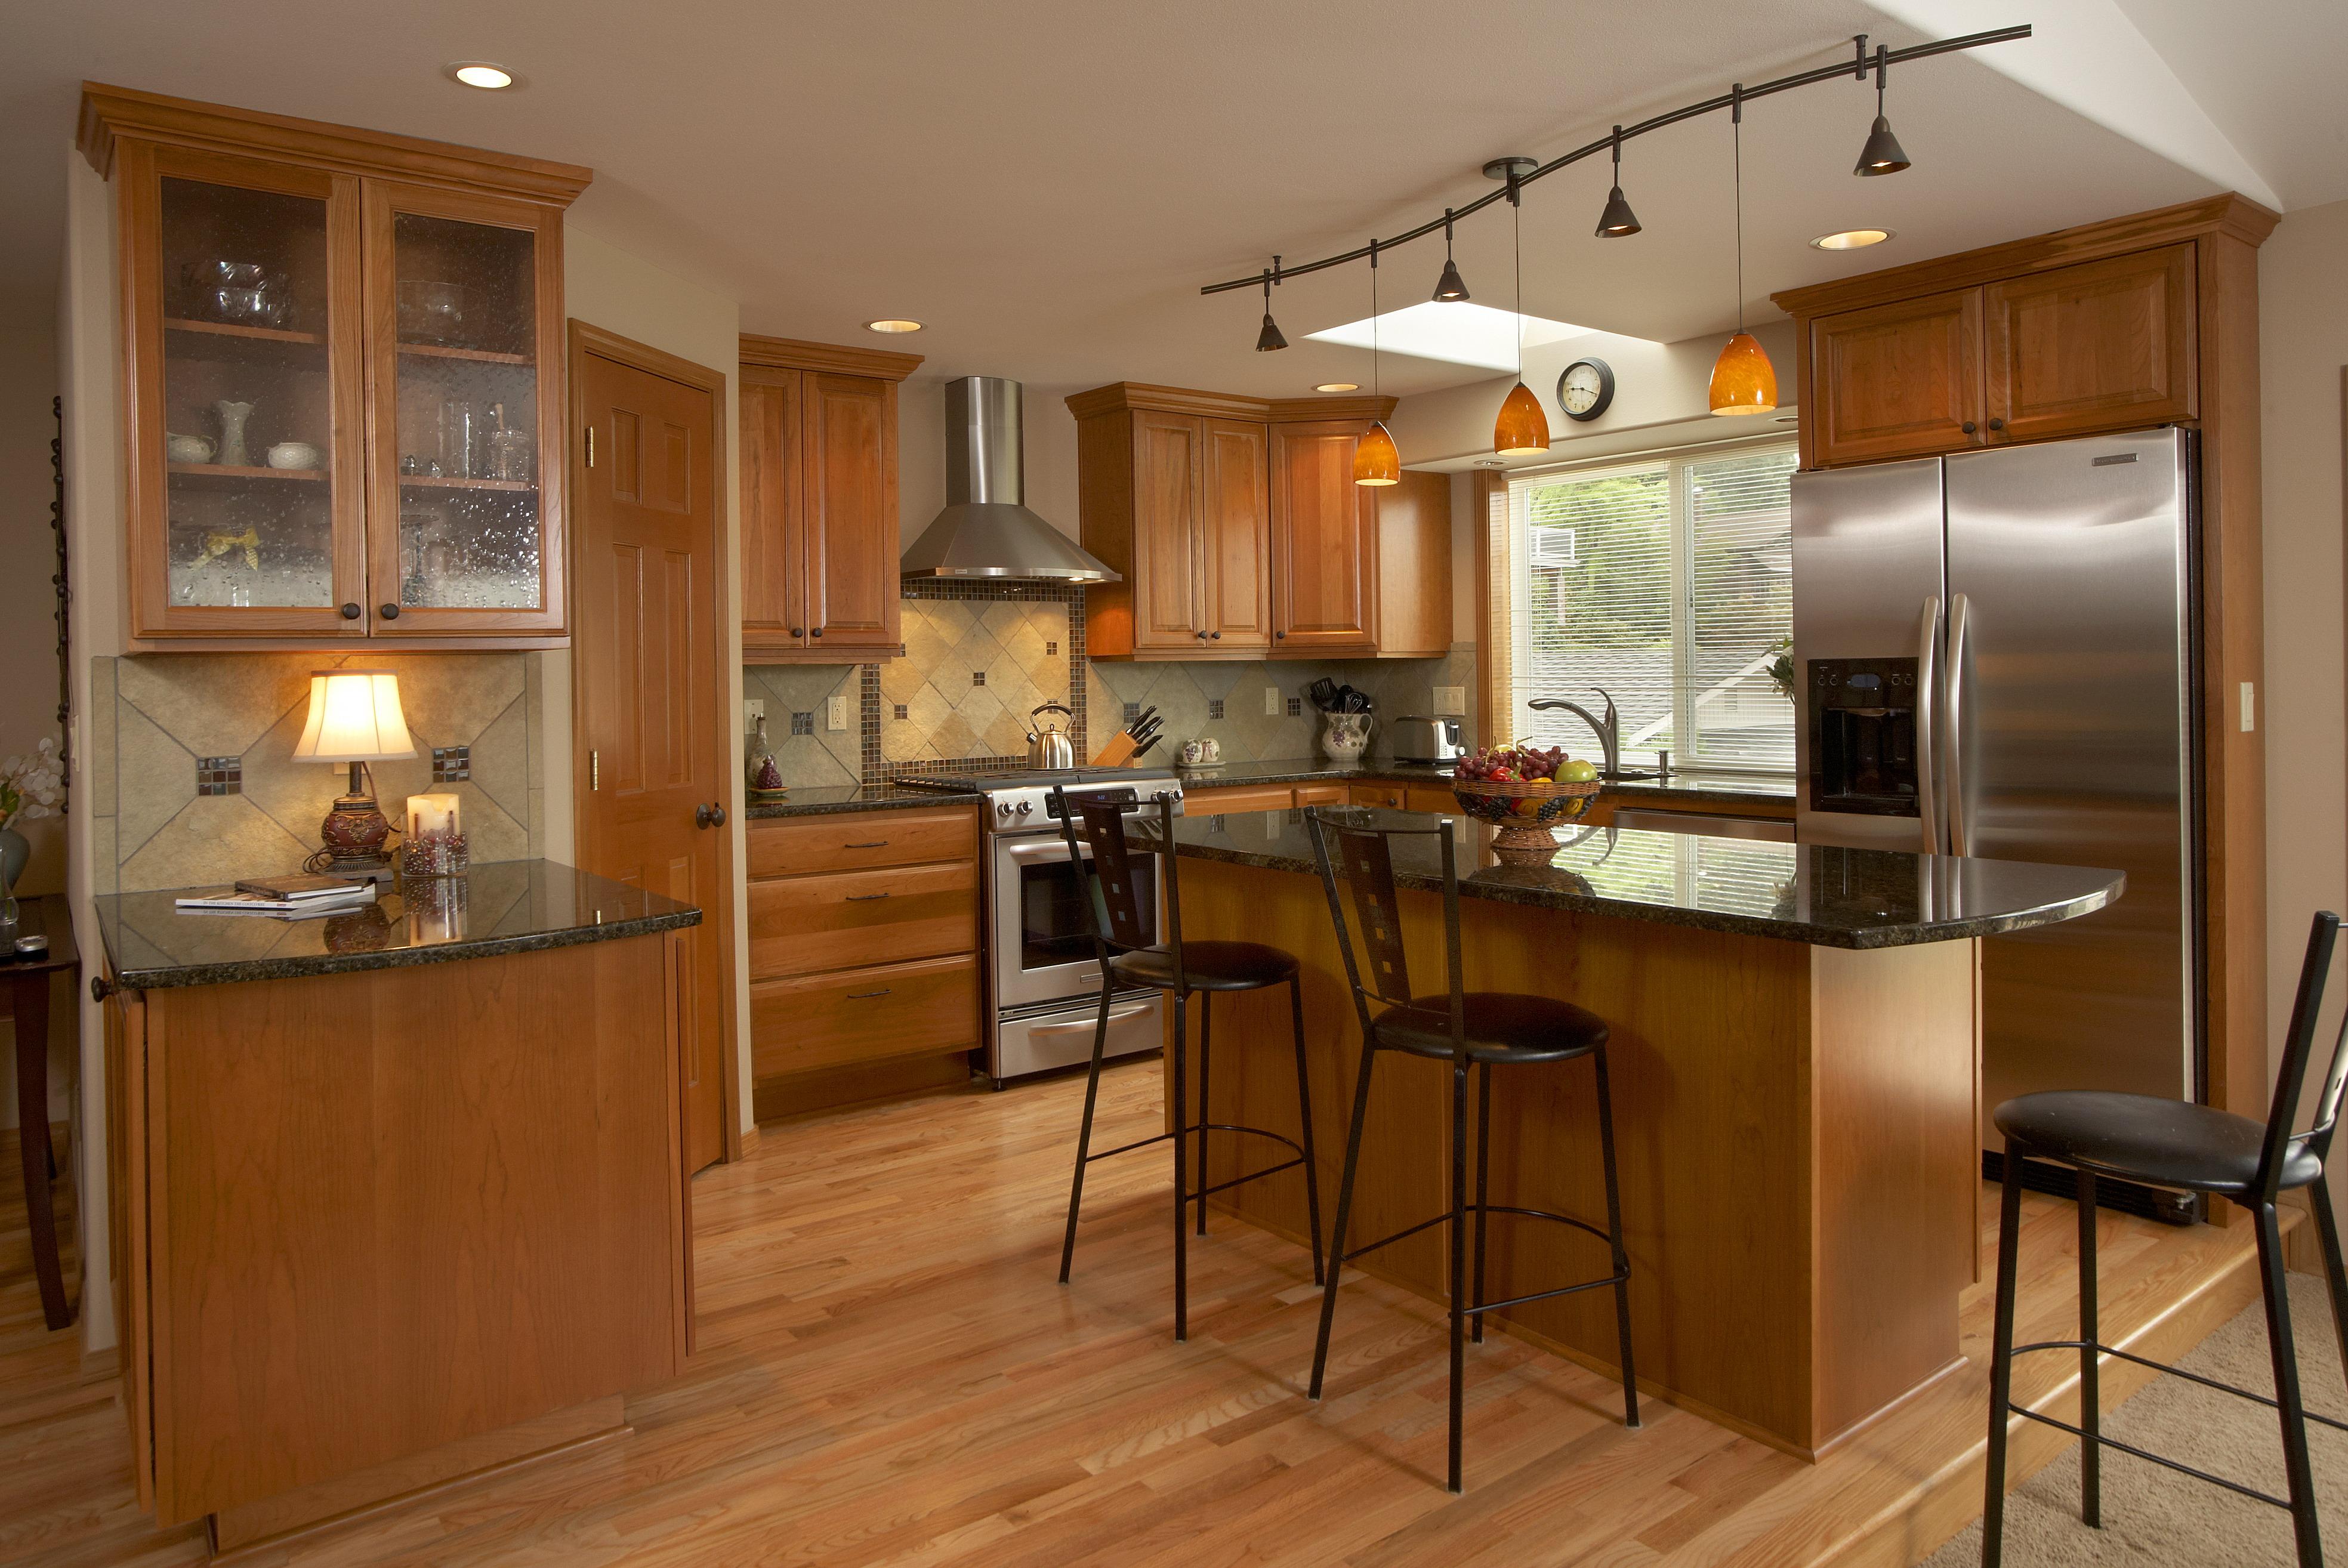 warm and inviting kitchen renovation mcadams remodeling. Black Bedroom Furniture Sets. Home Design Ideas